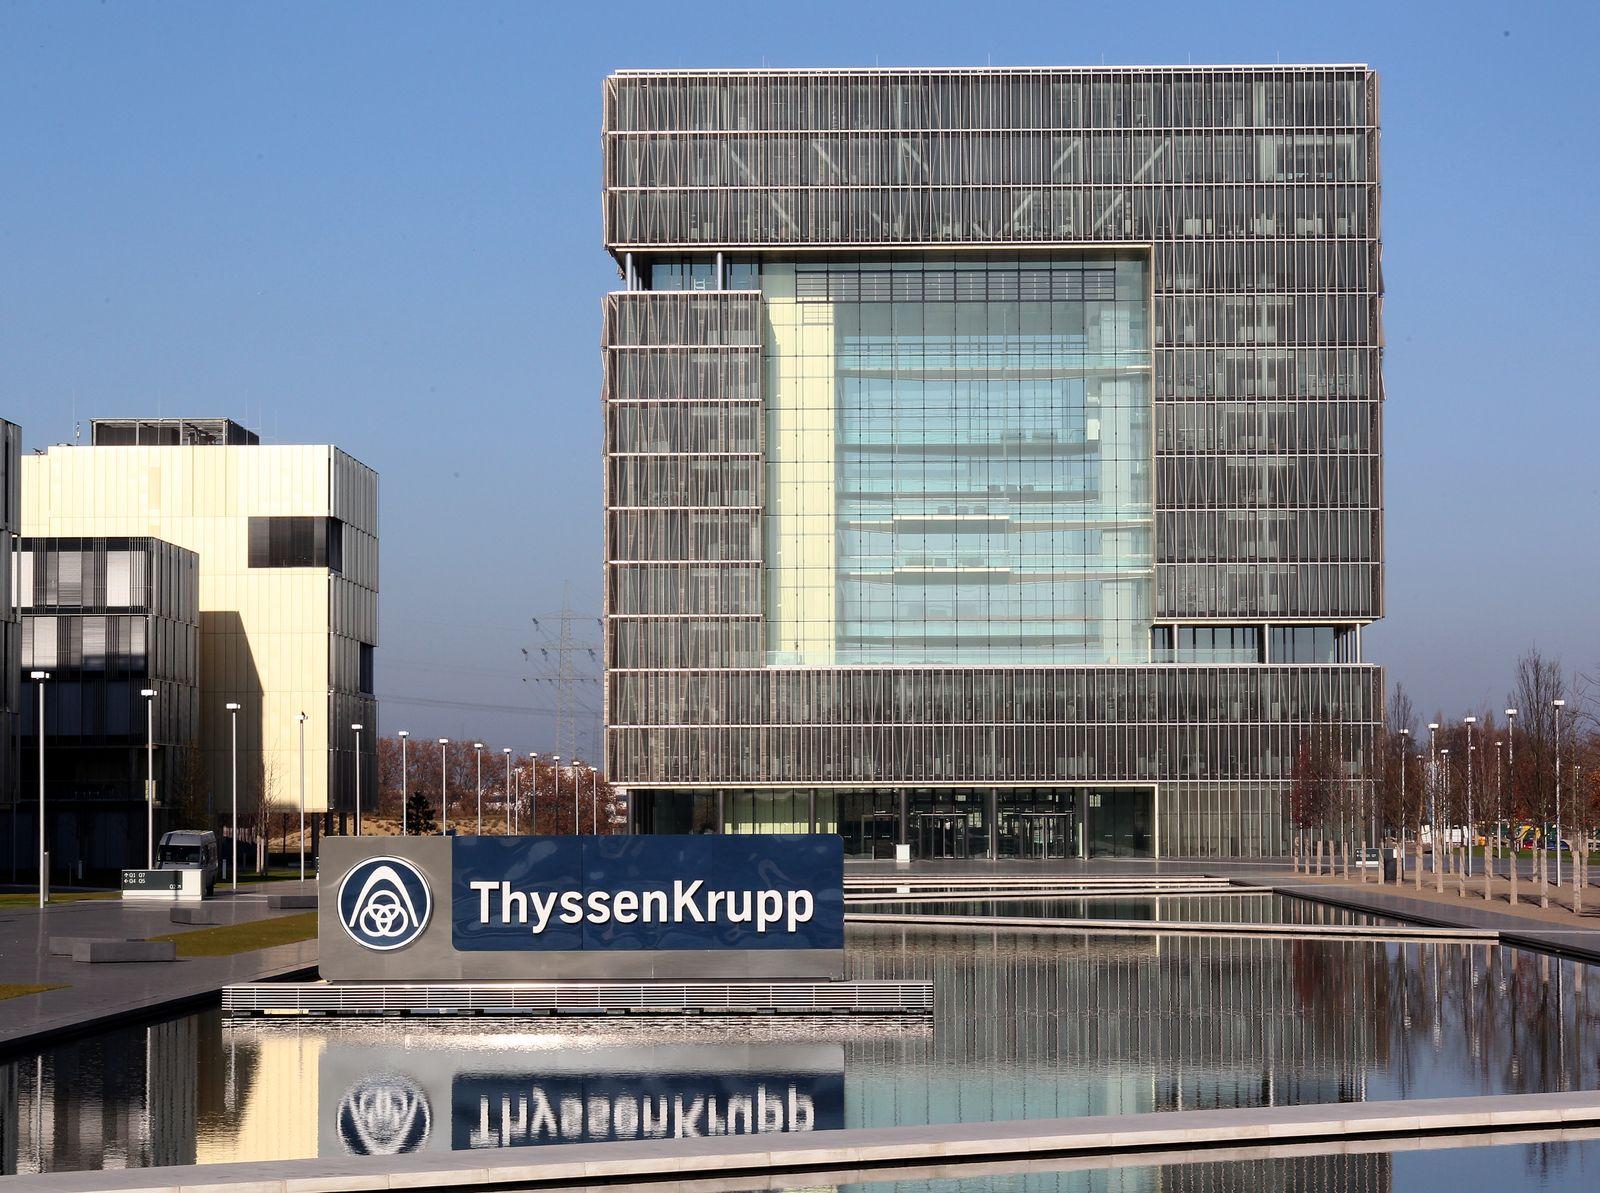 ThyssenKrupp Zentrale